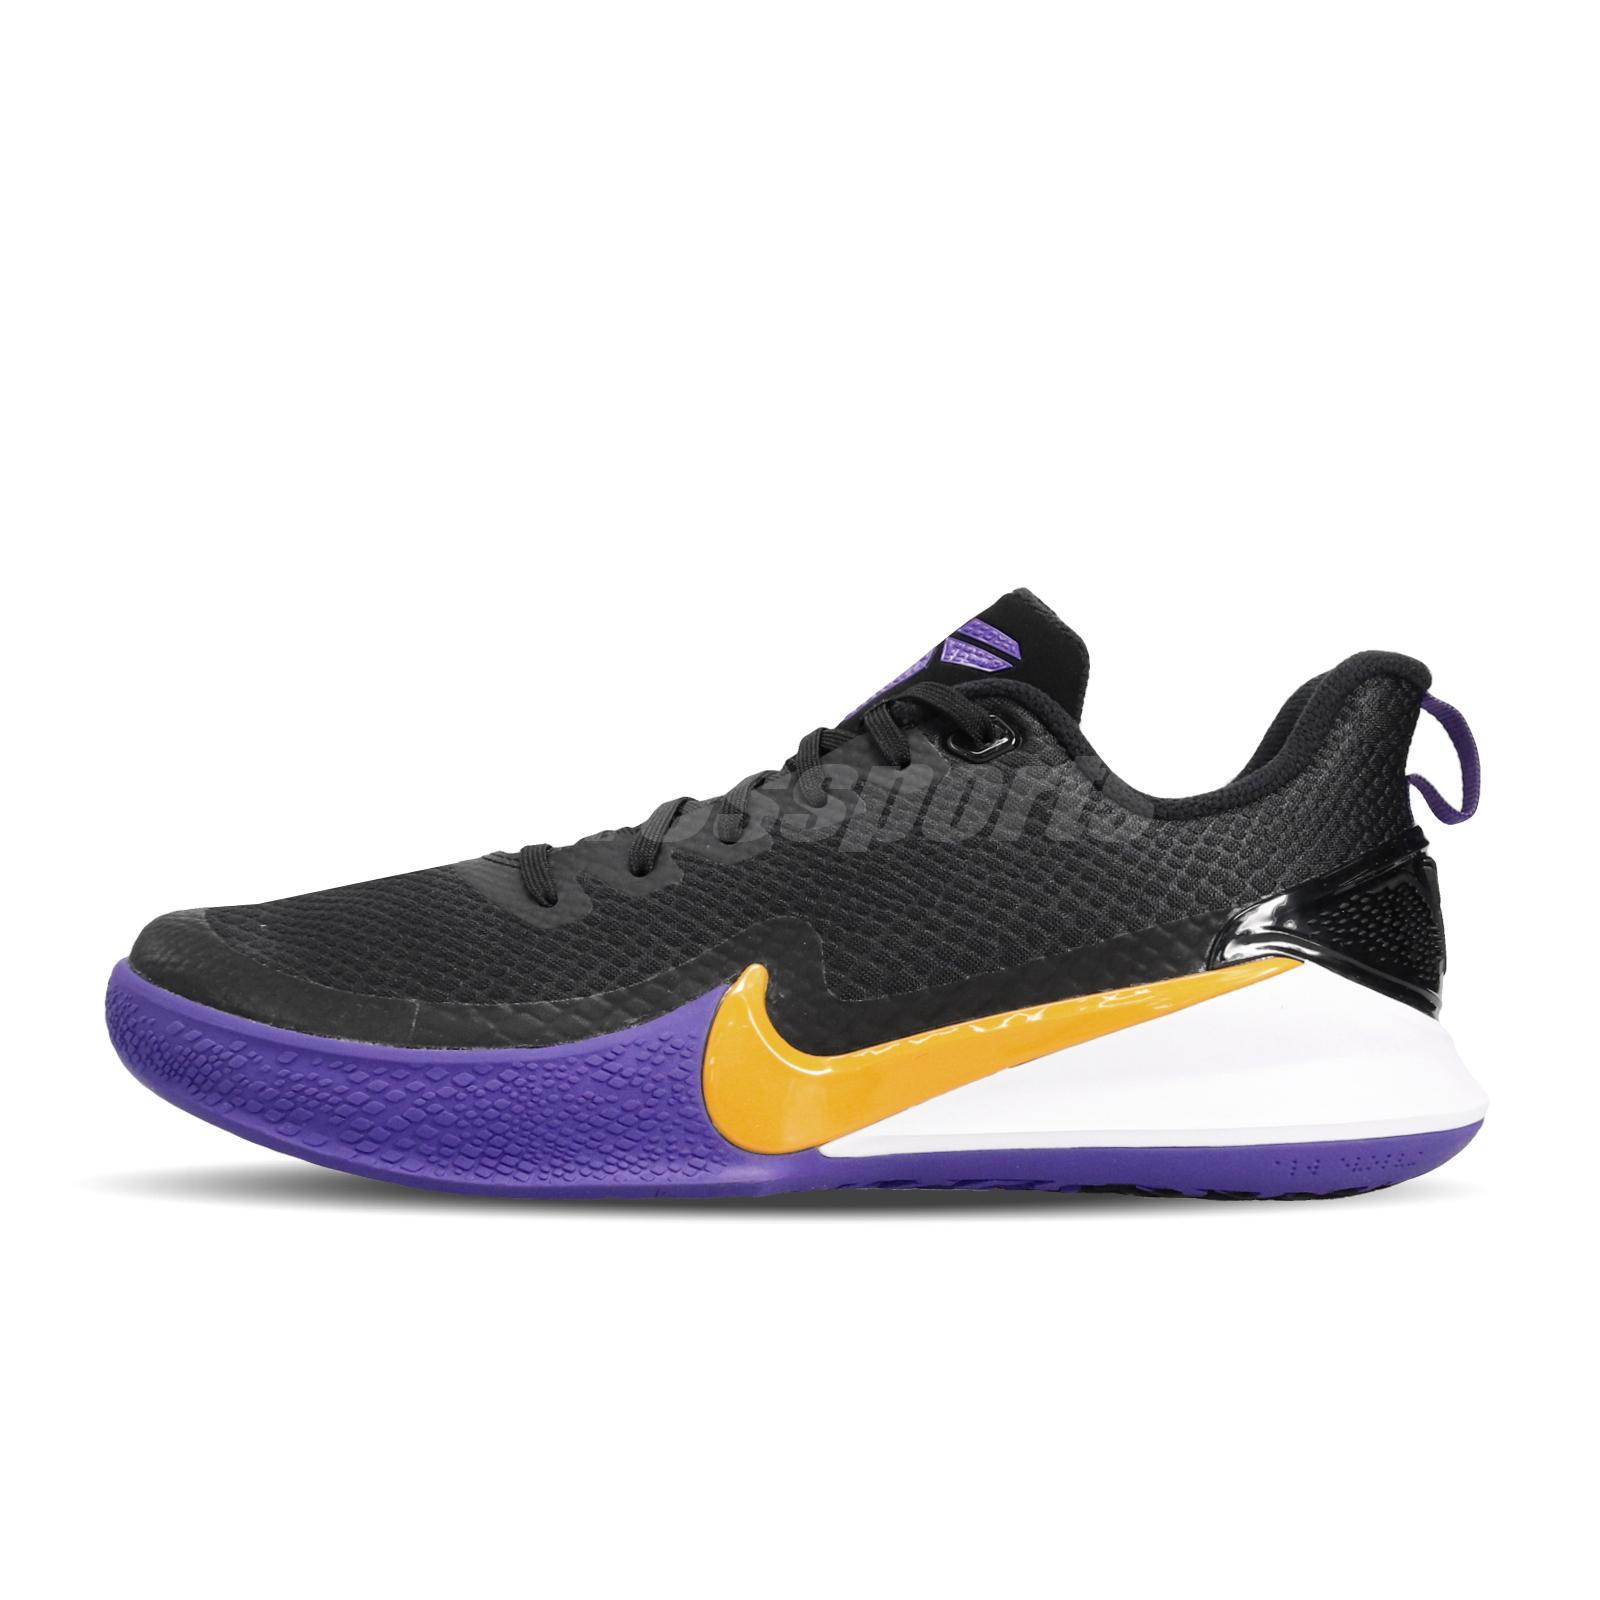 De confianza Kakadu Artificial  Nike Mamba Focus Kobe Bryant Lakers negro púrpura hombres Tenis de ...